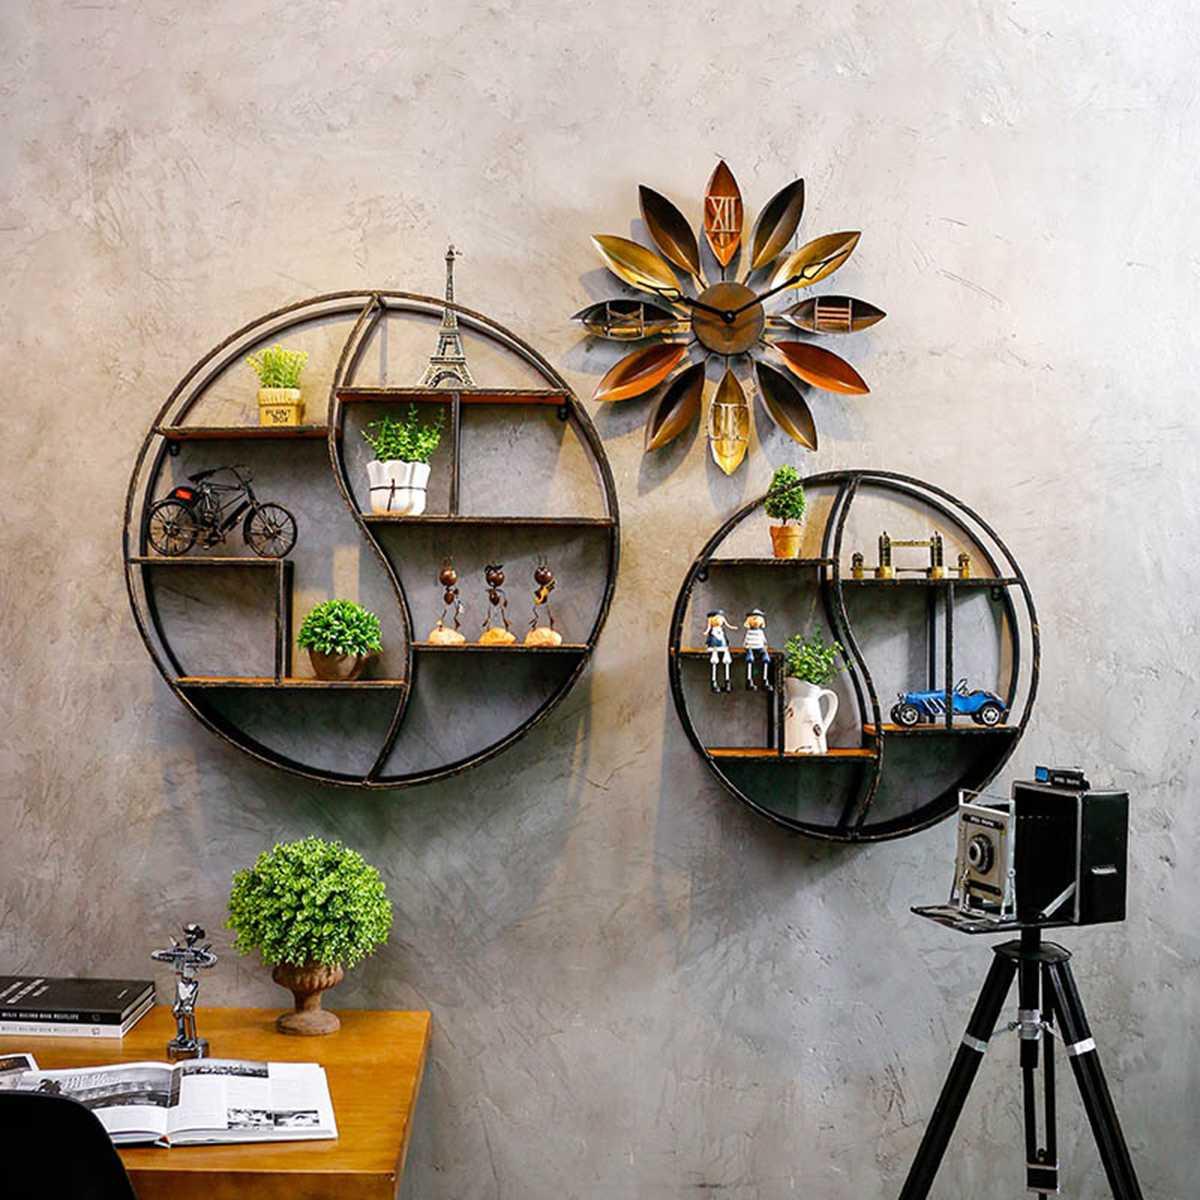 Round Wood Iron Books Vase Jewelry Display Shelf Hanging Stand Retro Style YIN YANG Pattern Wall mounted Storage Rack Organiser